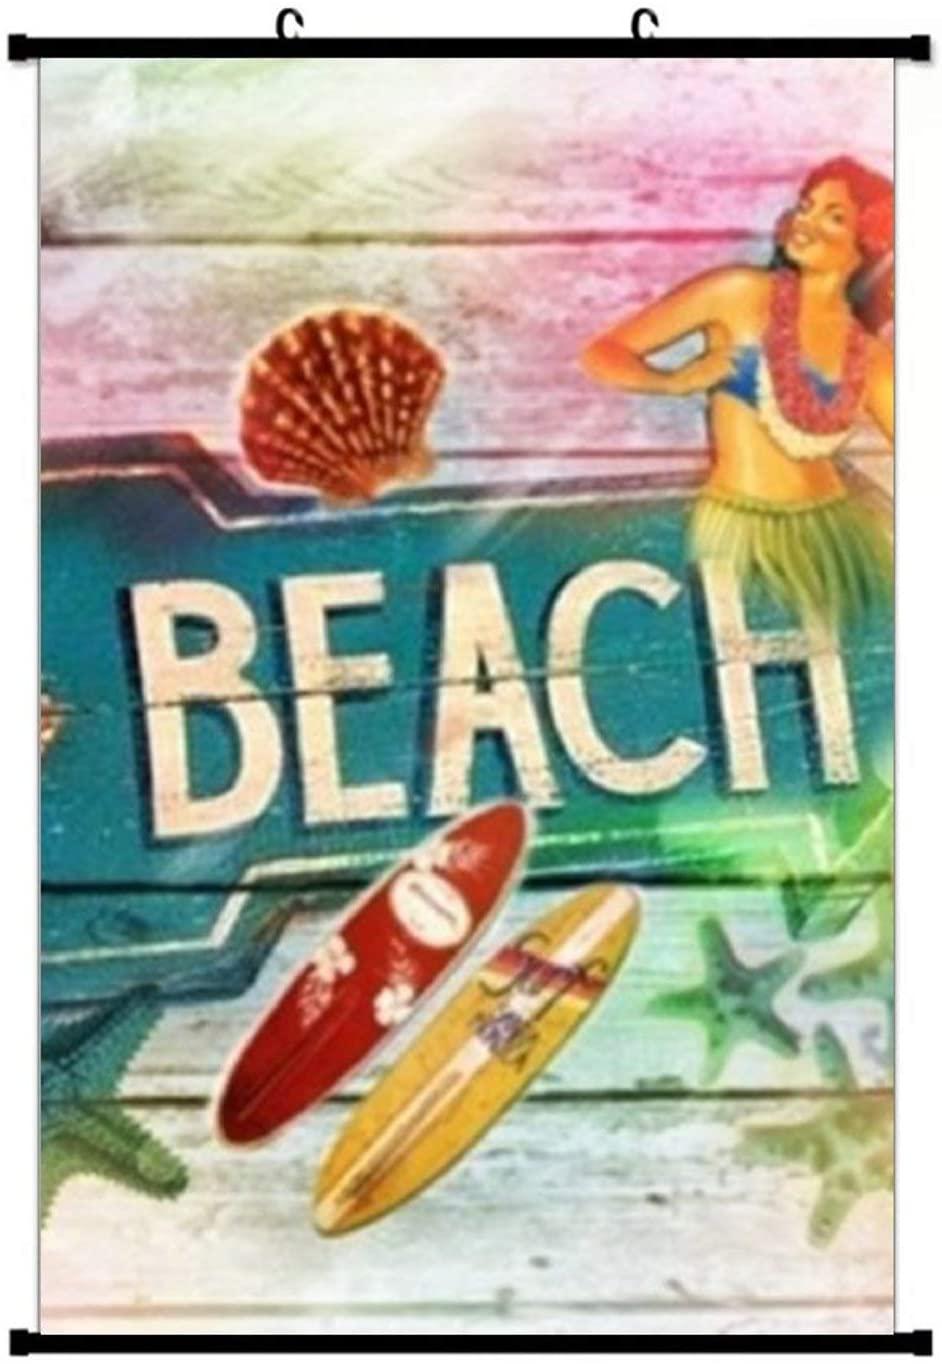 Rainbow Surfer Beach Hawaiian Posters Wall Art Prints Home Scroll Poster Wall Decor 16 x 24 inches